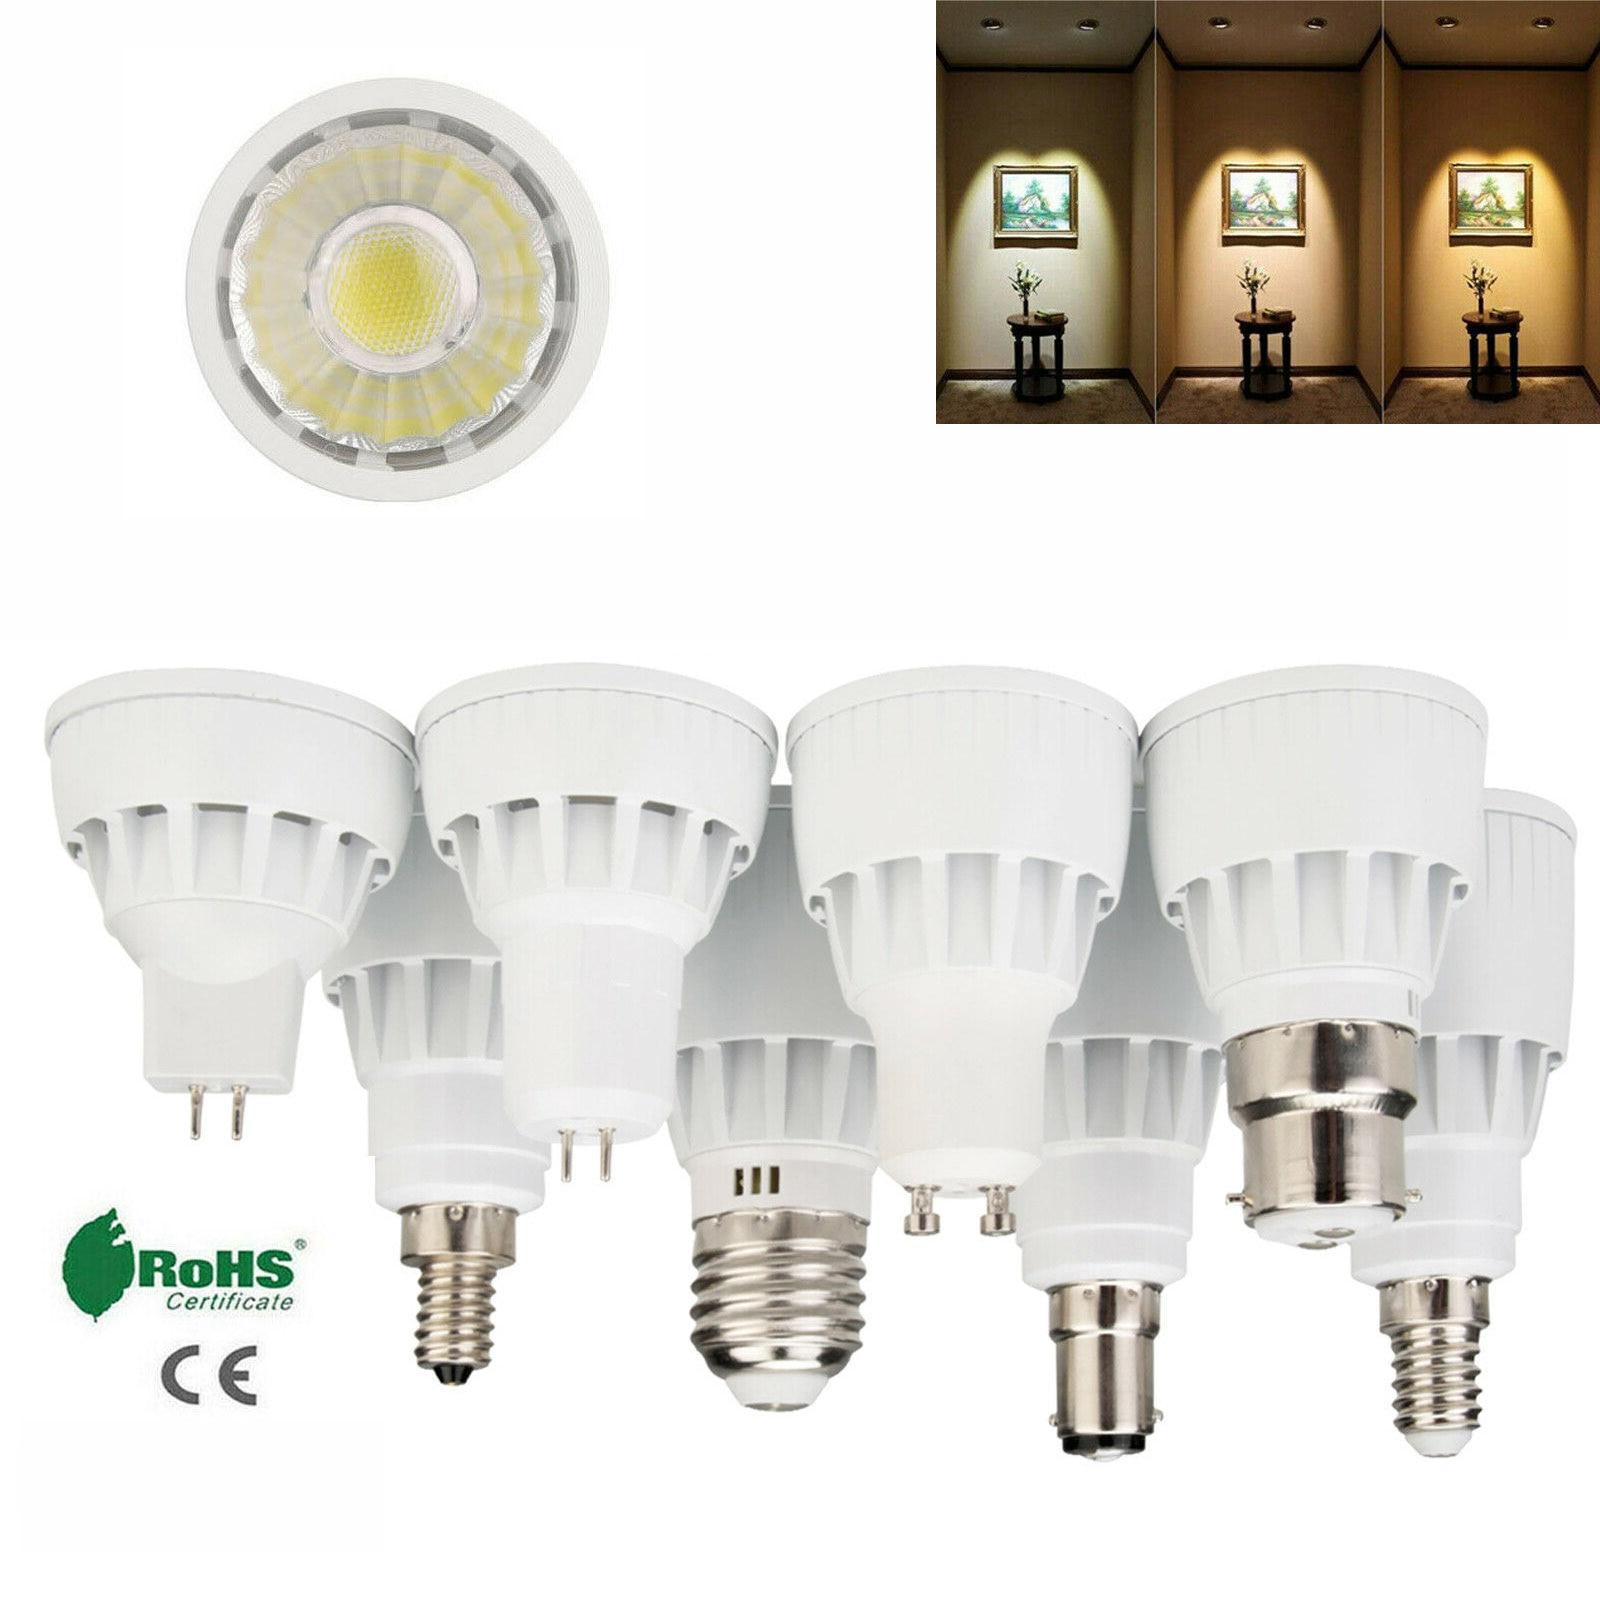 GU10 COB LED Spotlight 7W MR16 GU5.3 Bulbs Light White Warm White Lamp 220V